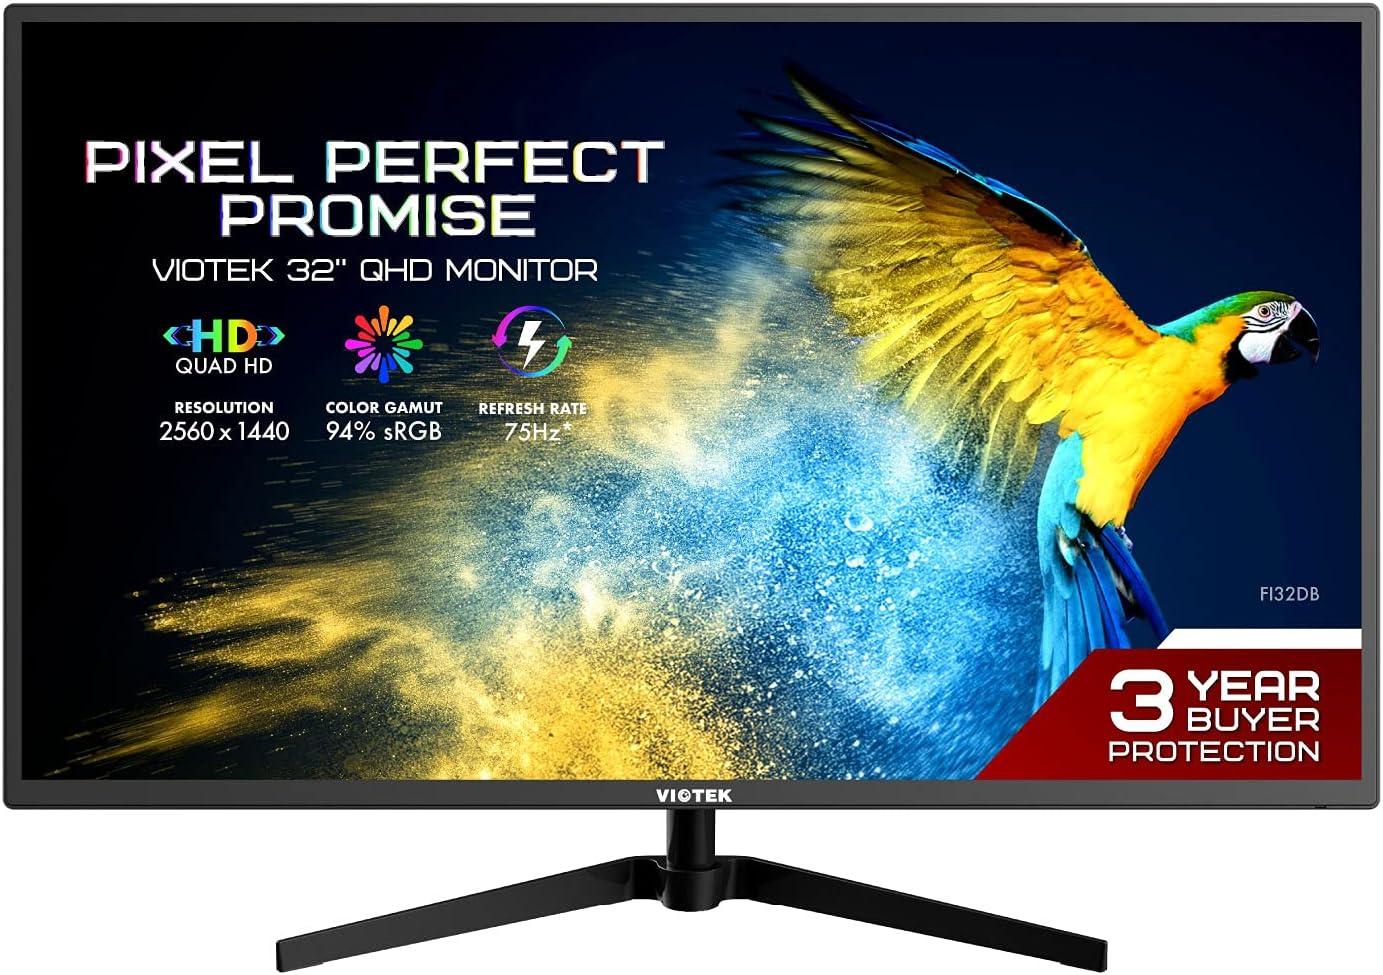 "VIOTEK FI32DB 32"" 75Hz QHD 1440p Monitor IPS 10-bit Color Display – Multi-Use Calibration for PC Gaming, Artistic Design and Entertainment via HDMI Mini-DP DisplayPort VGA – 3 Years Zero Dead Pixels"